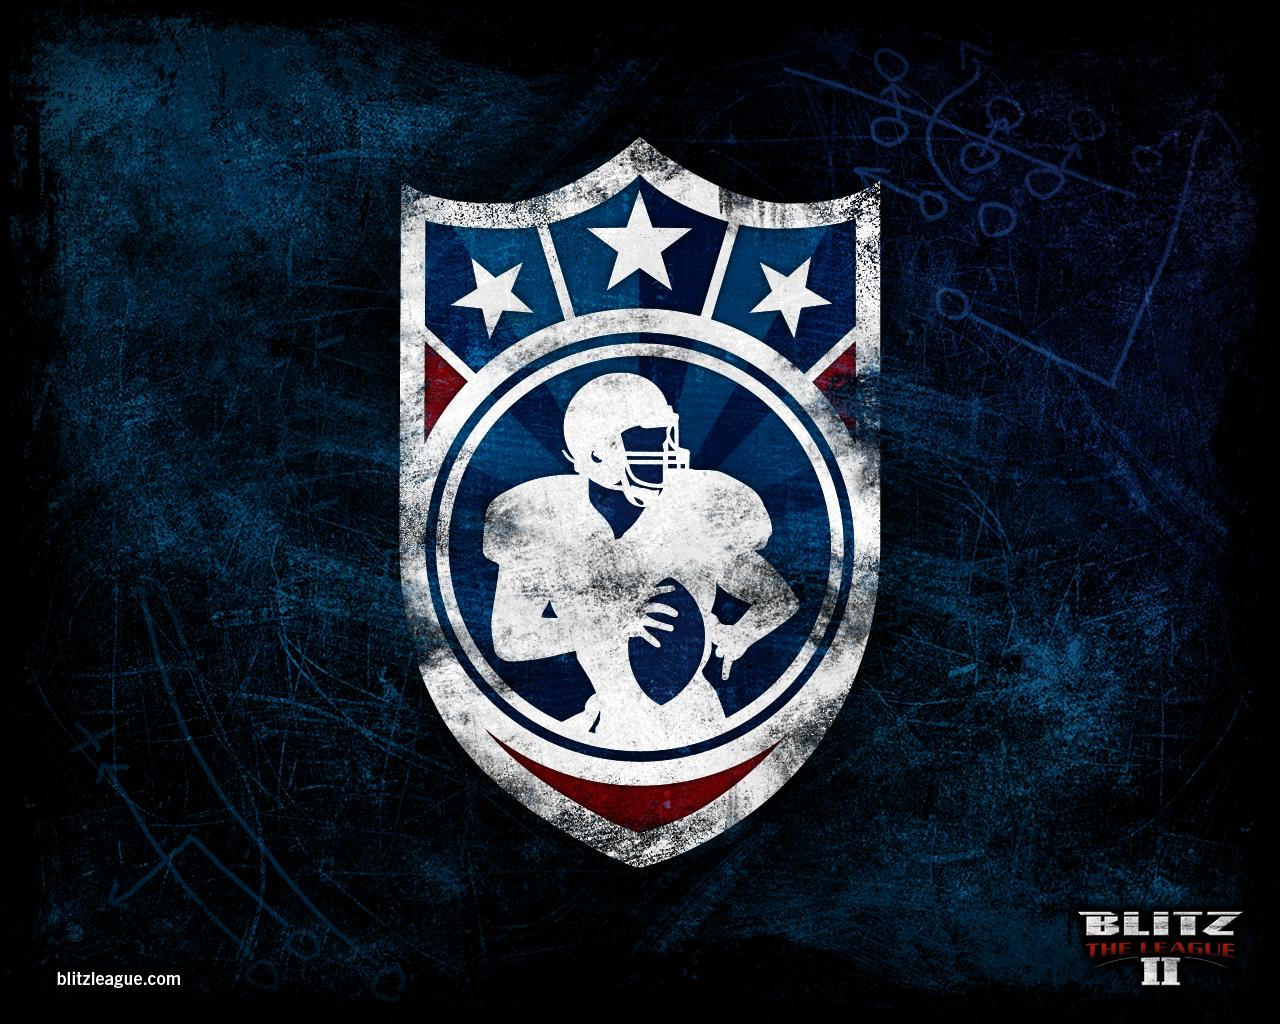 American Football Wallpapers Hd 1280x1024 pixel Hd Wallpaper 1280x1024